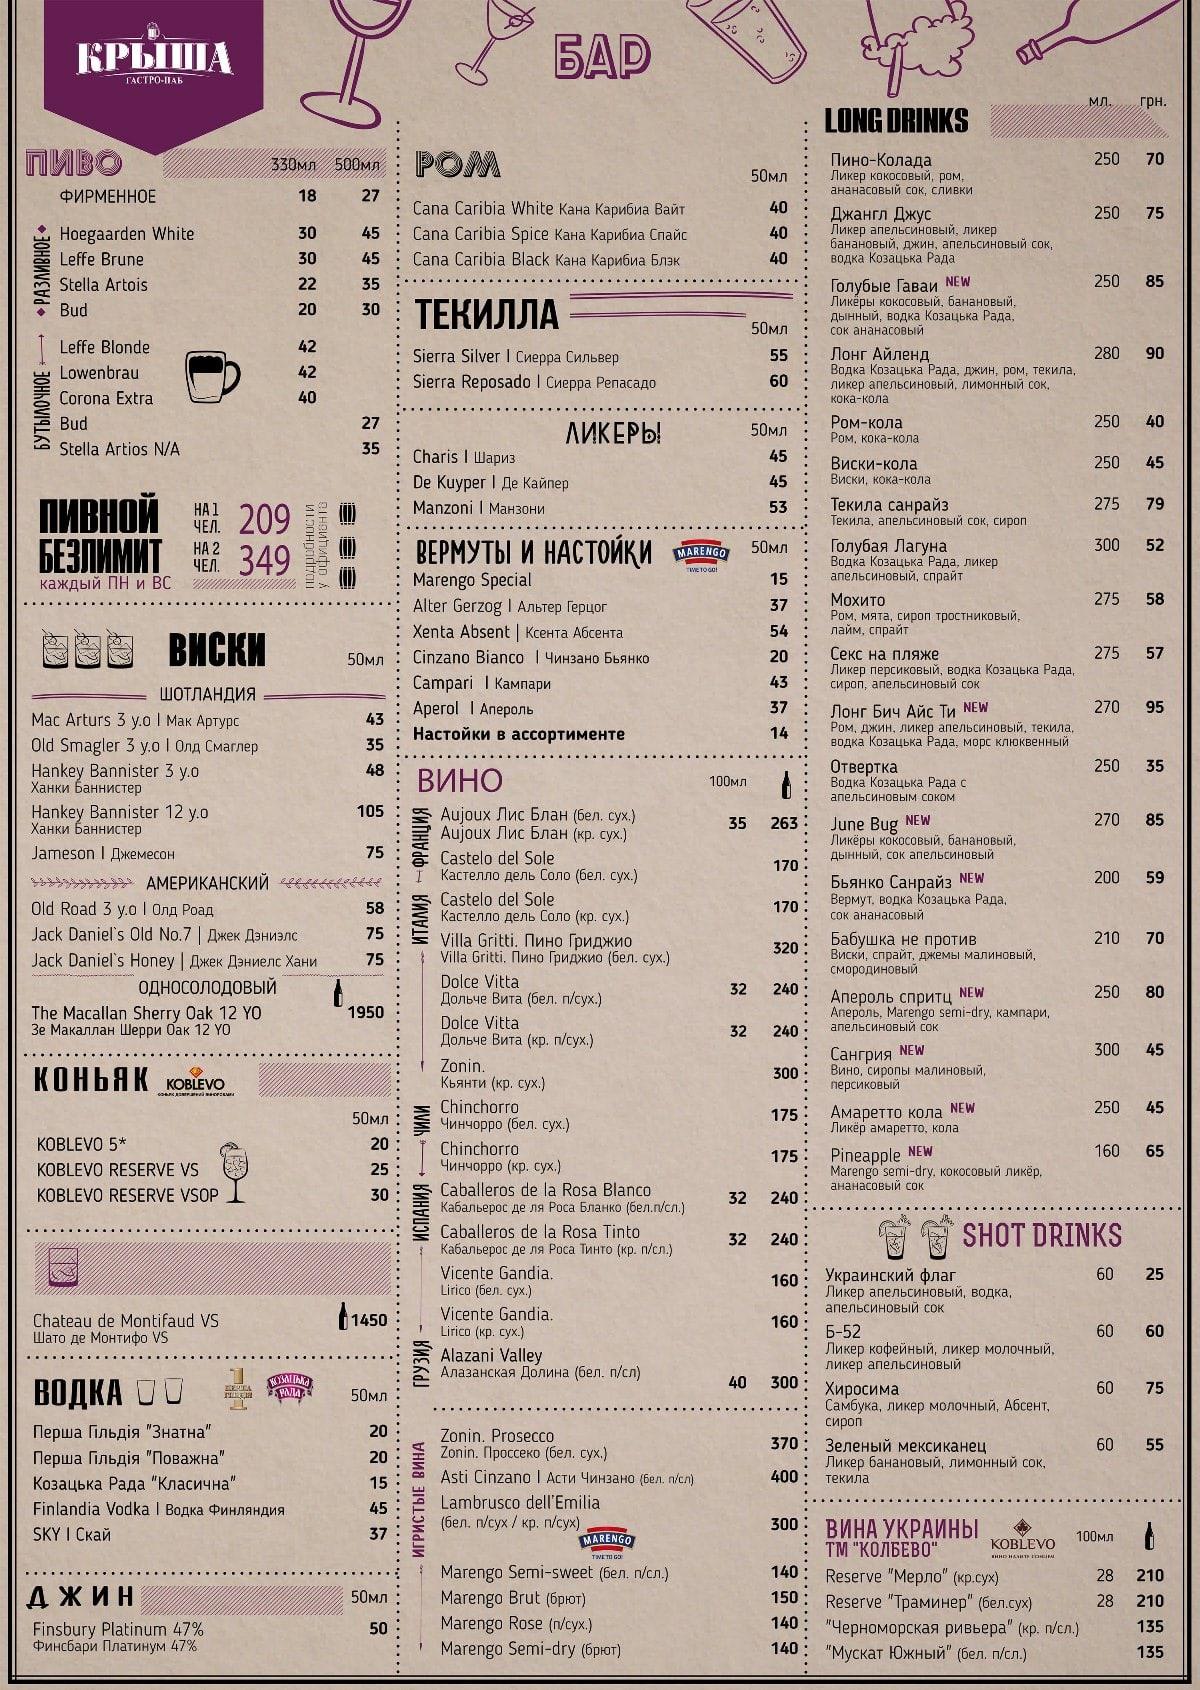 Кафе крыша меню алкоголь